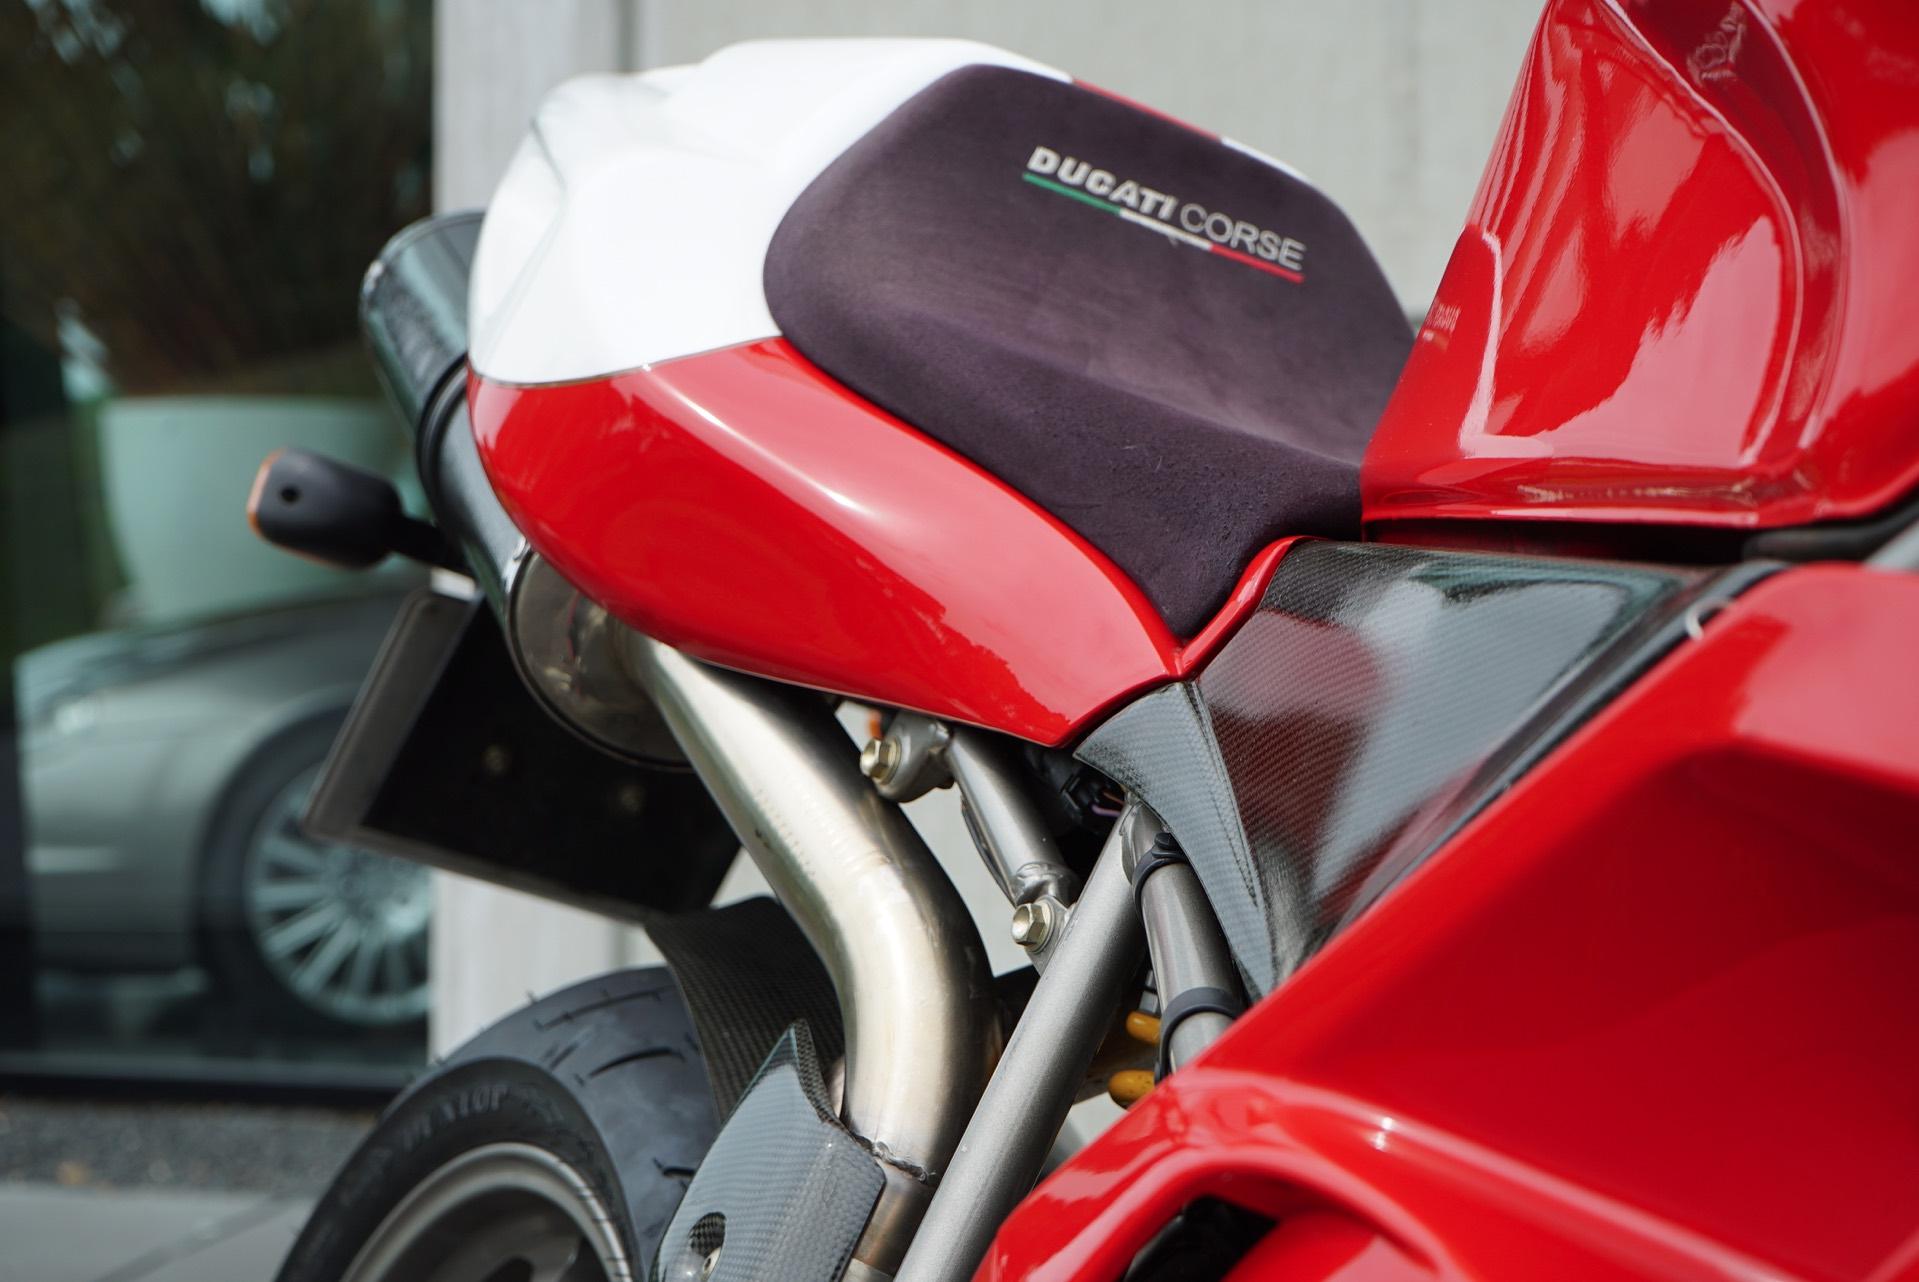 DUCATI 996 S